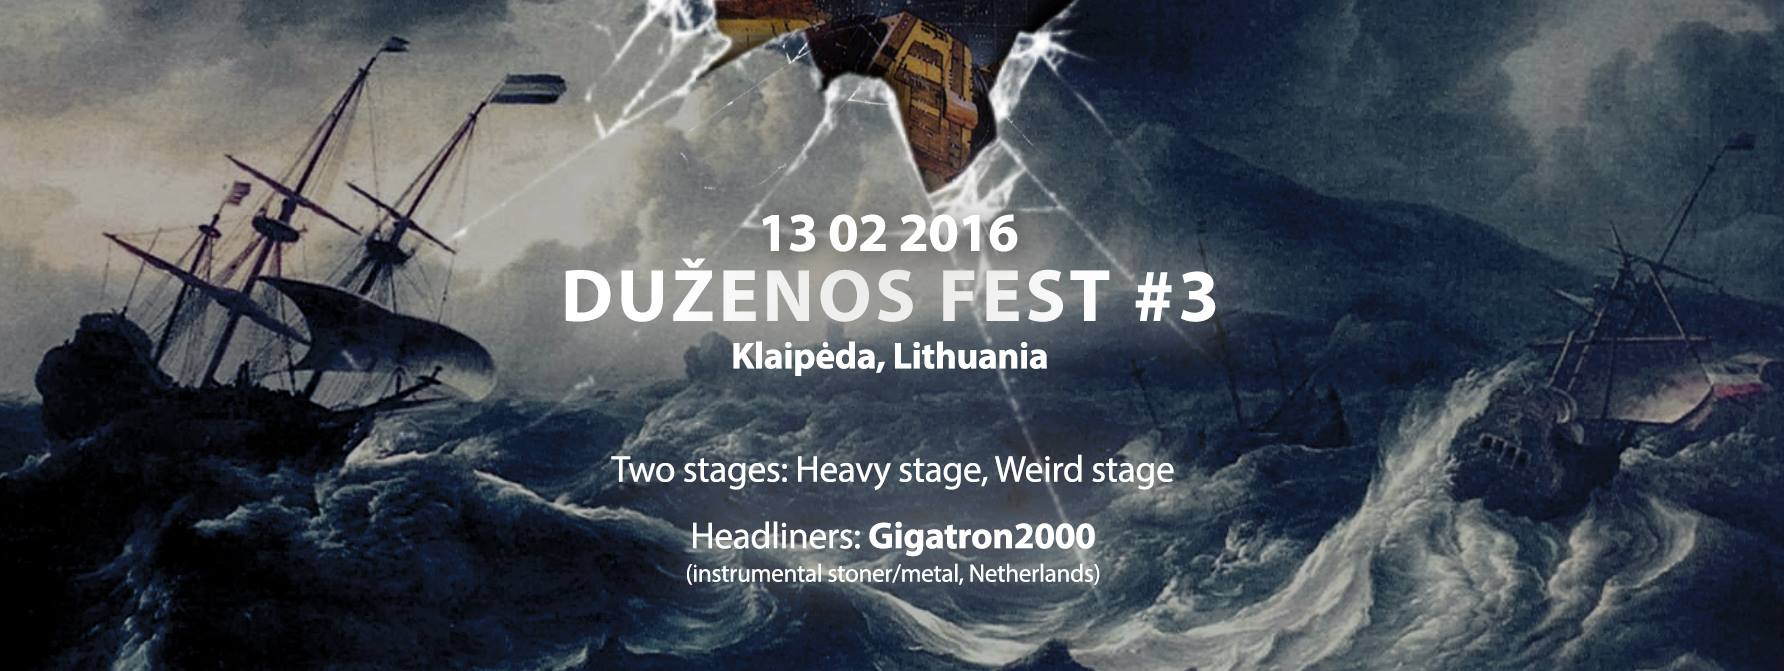 duzenos fest 3 updated FB cover